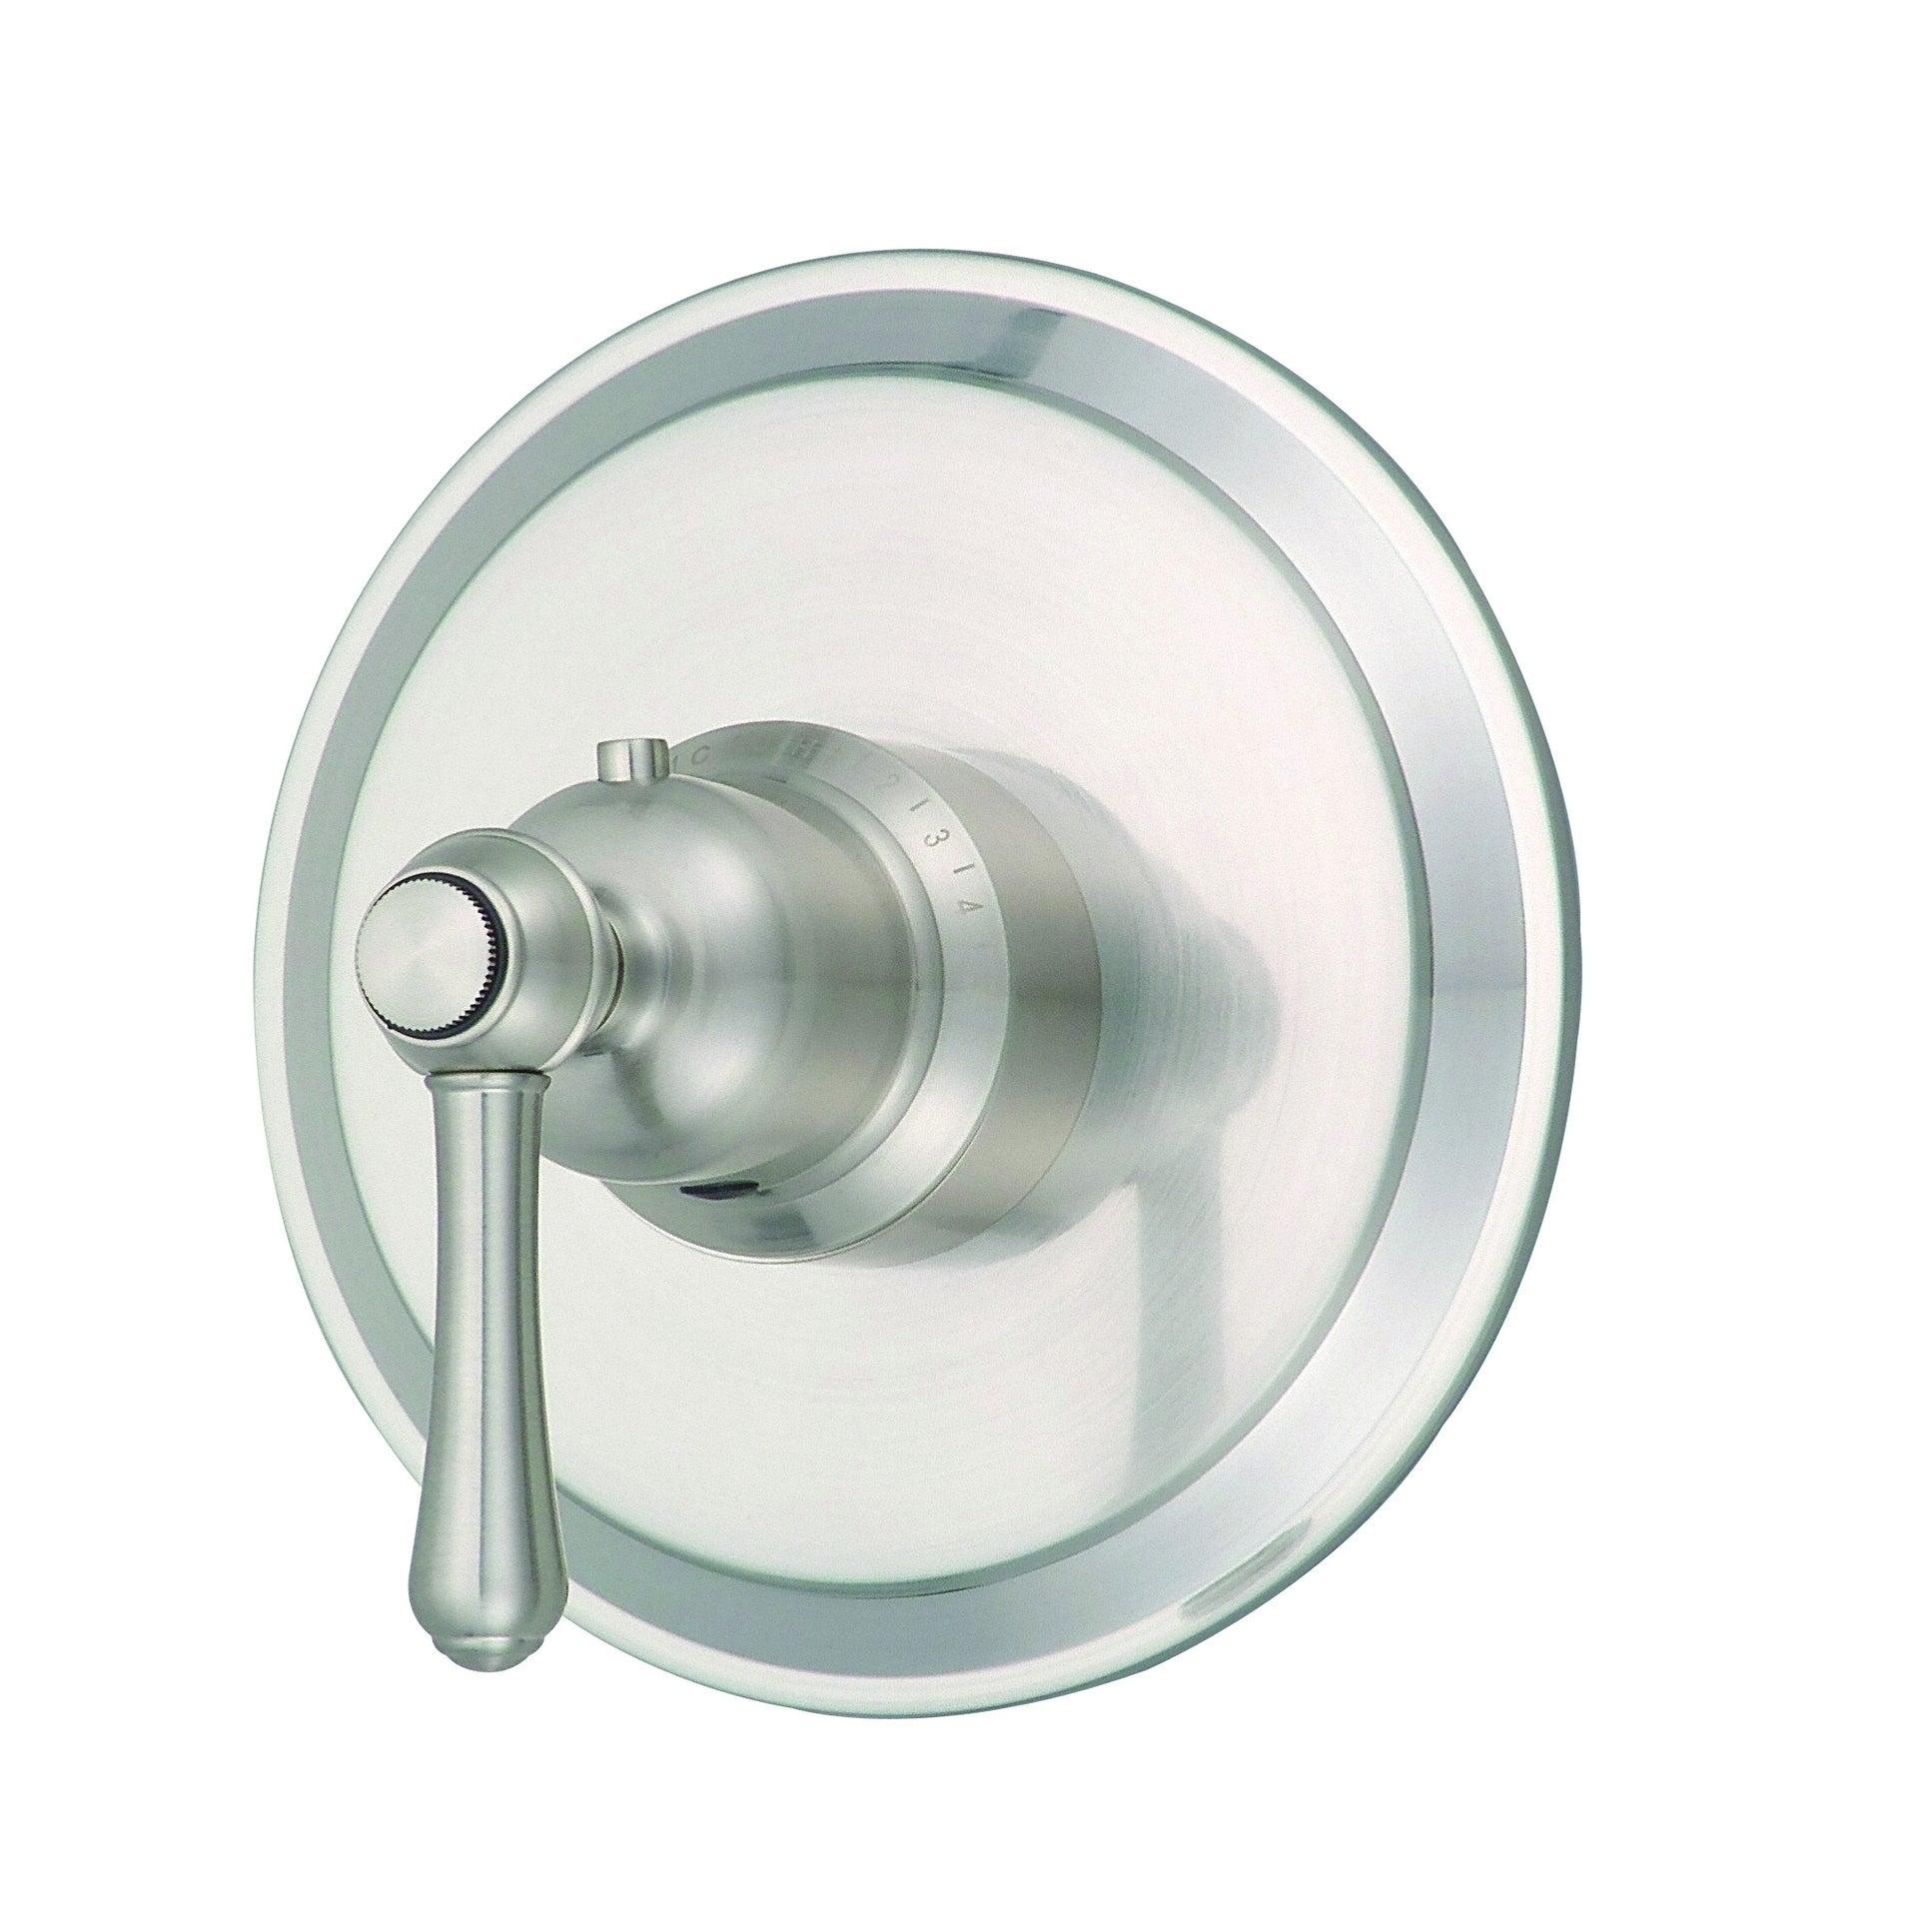 Opulence 1h 3 4 Thermostatic Valve Trim Kit Brushed Nickel Gray